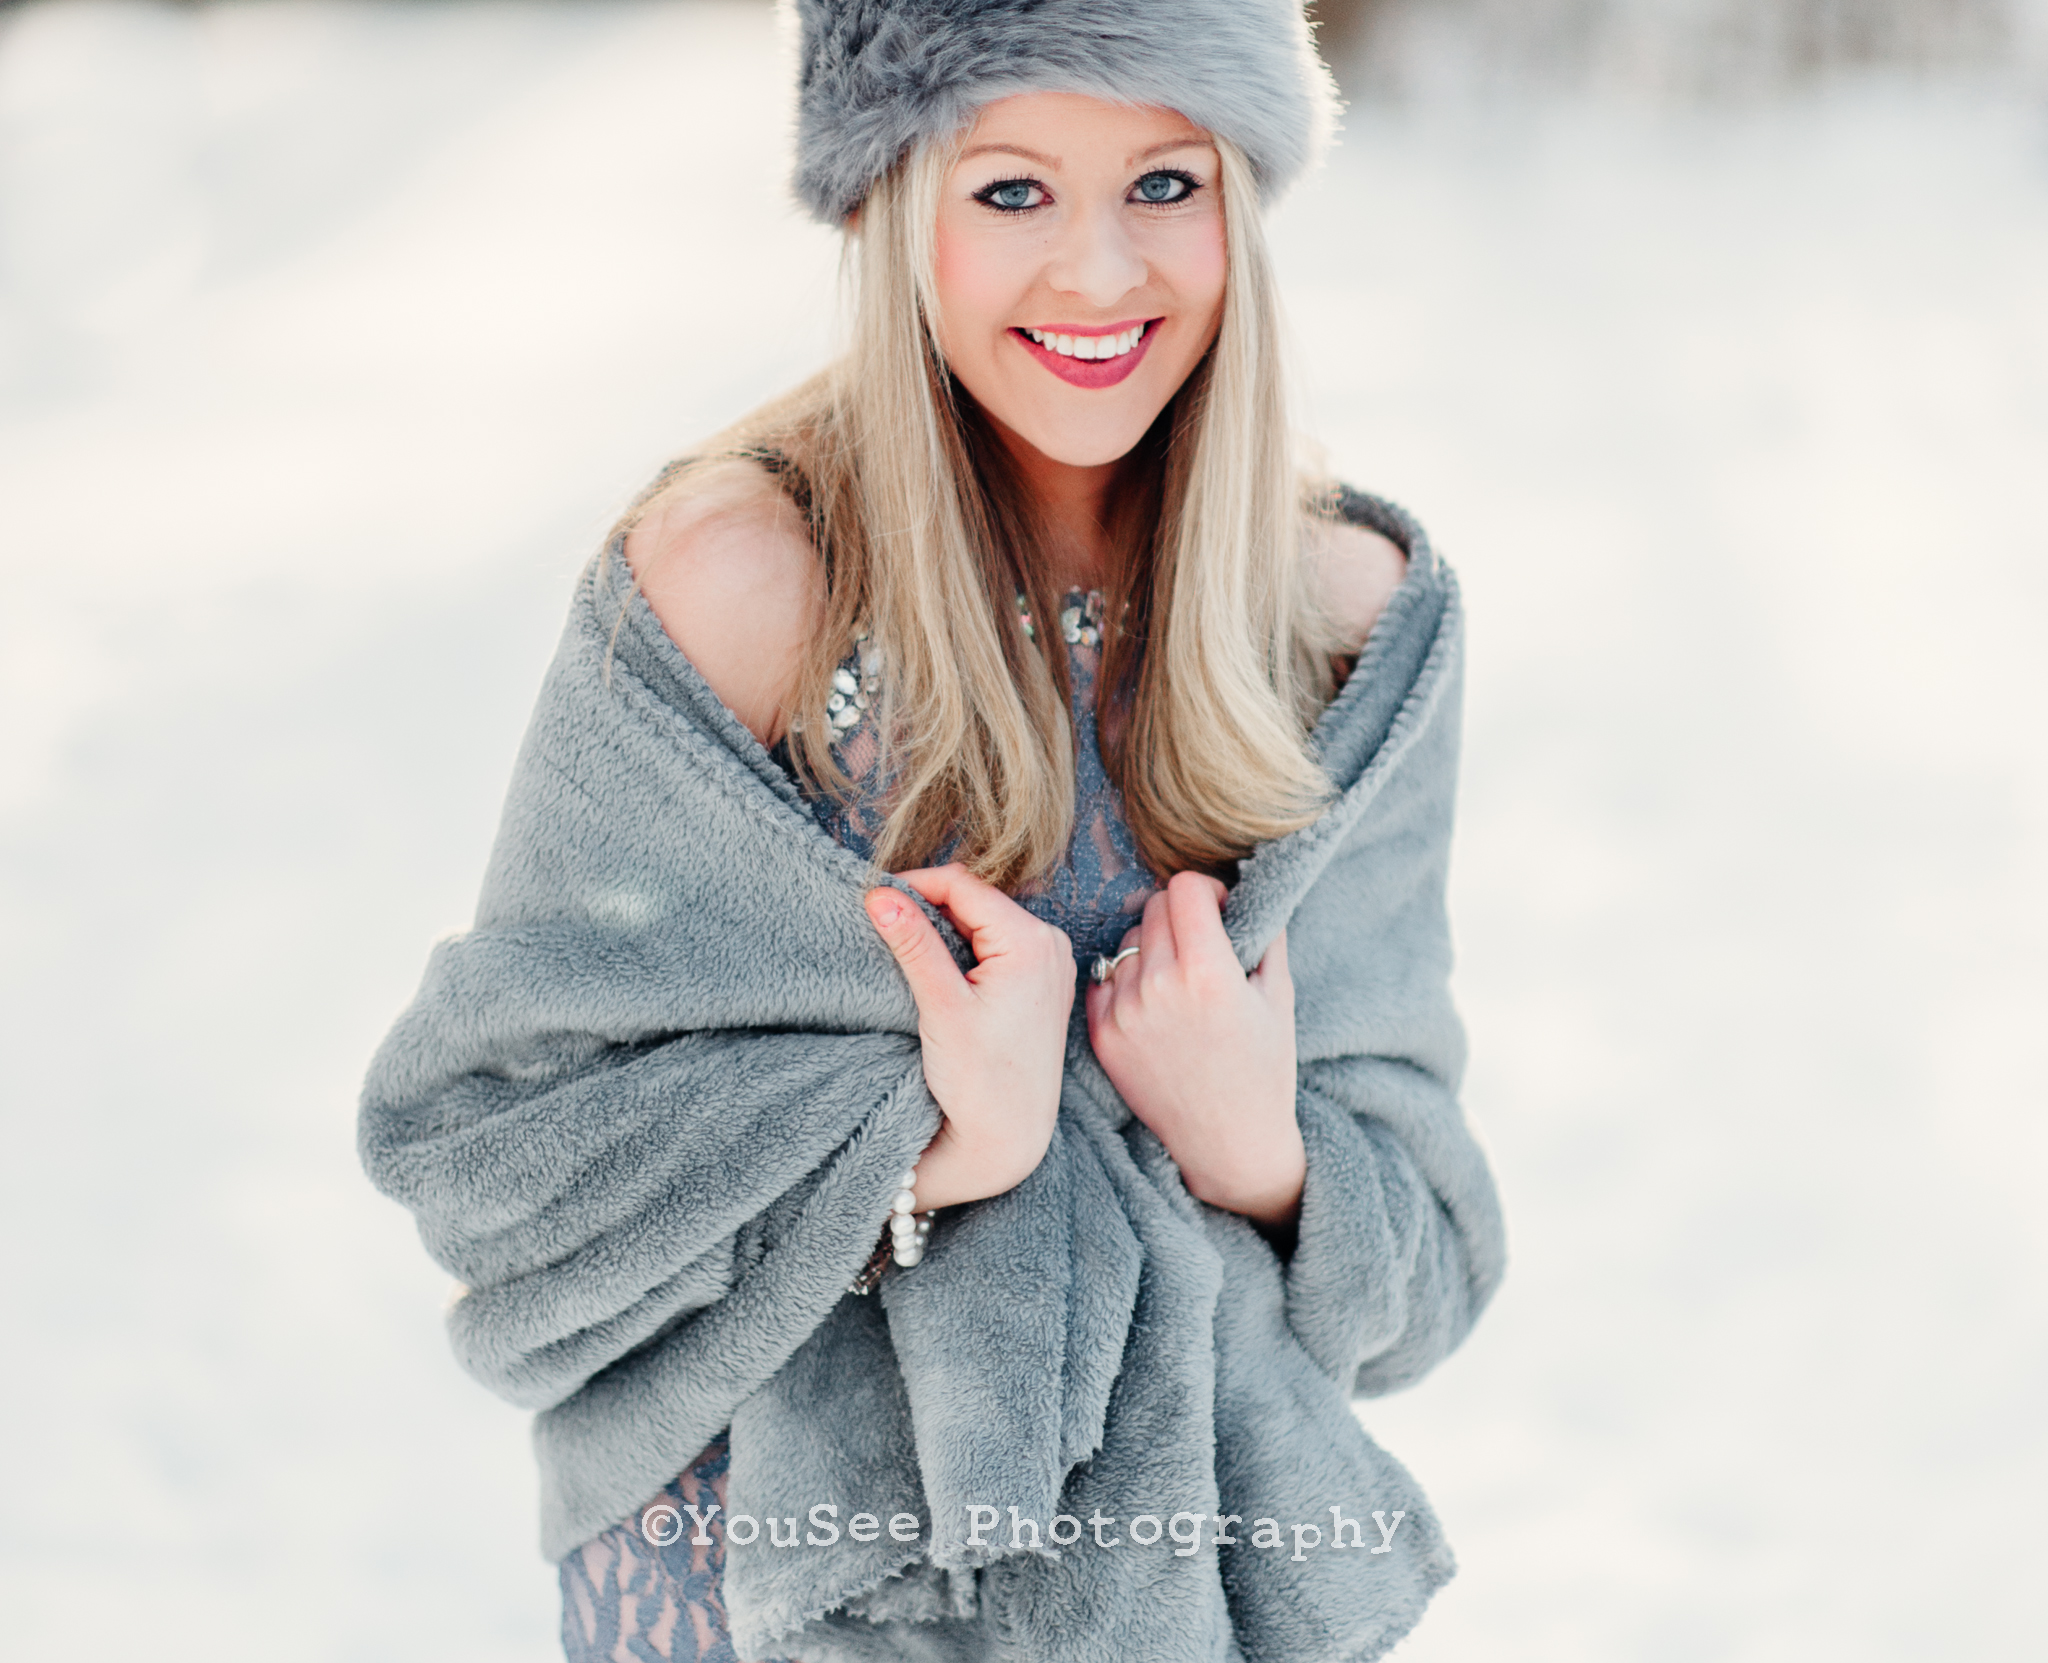 seniorportrait_fredericksburg_photography_winter2 (13)